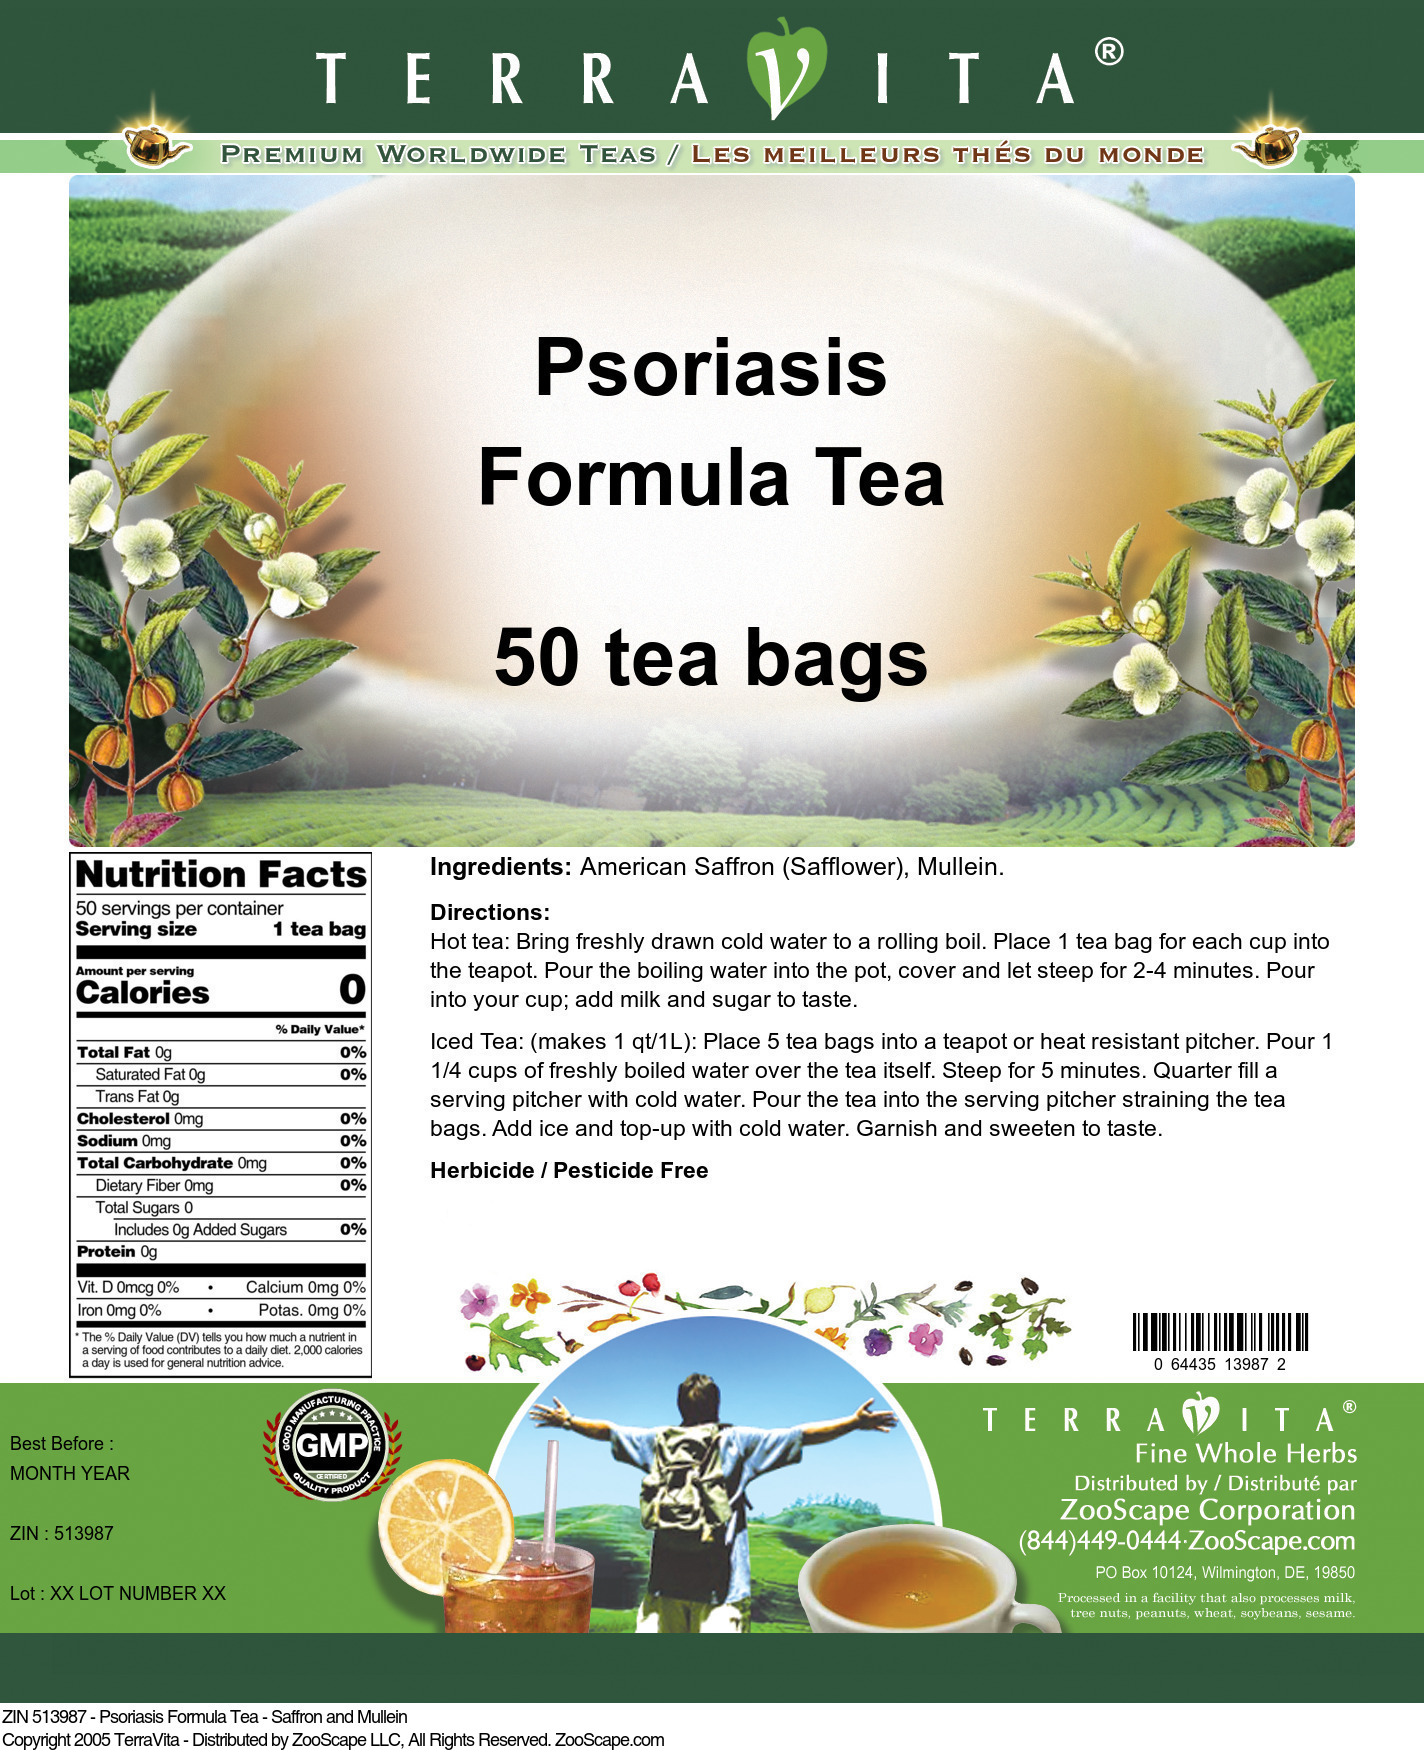 Psoriasis Formula Tea - Saffron and Mullein